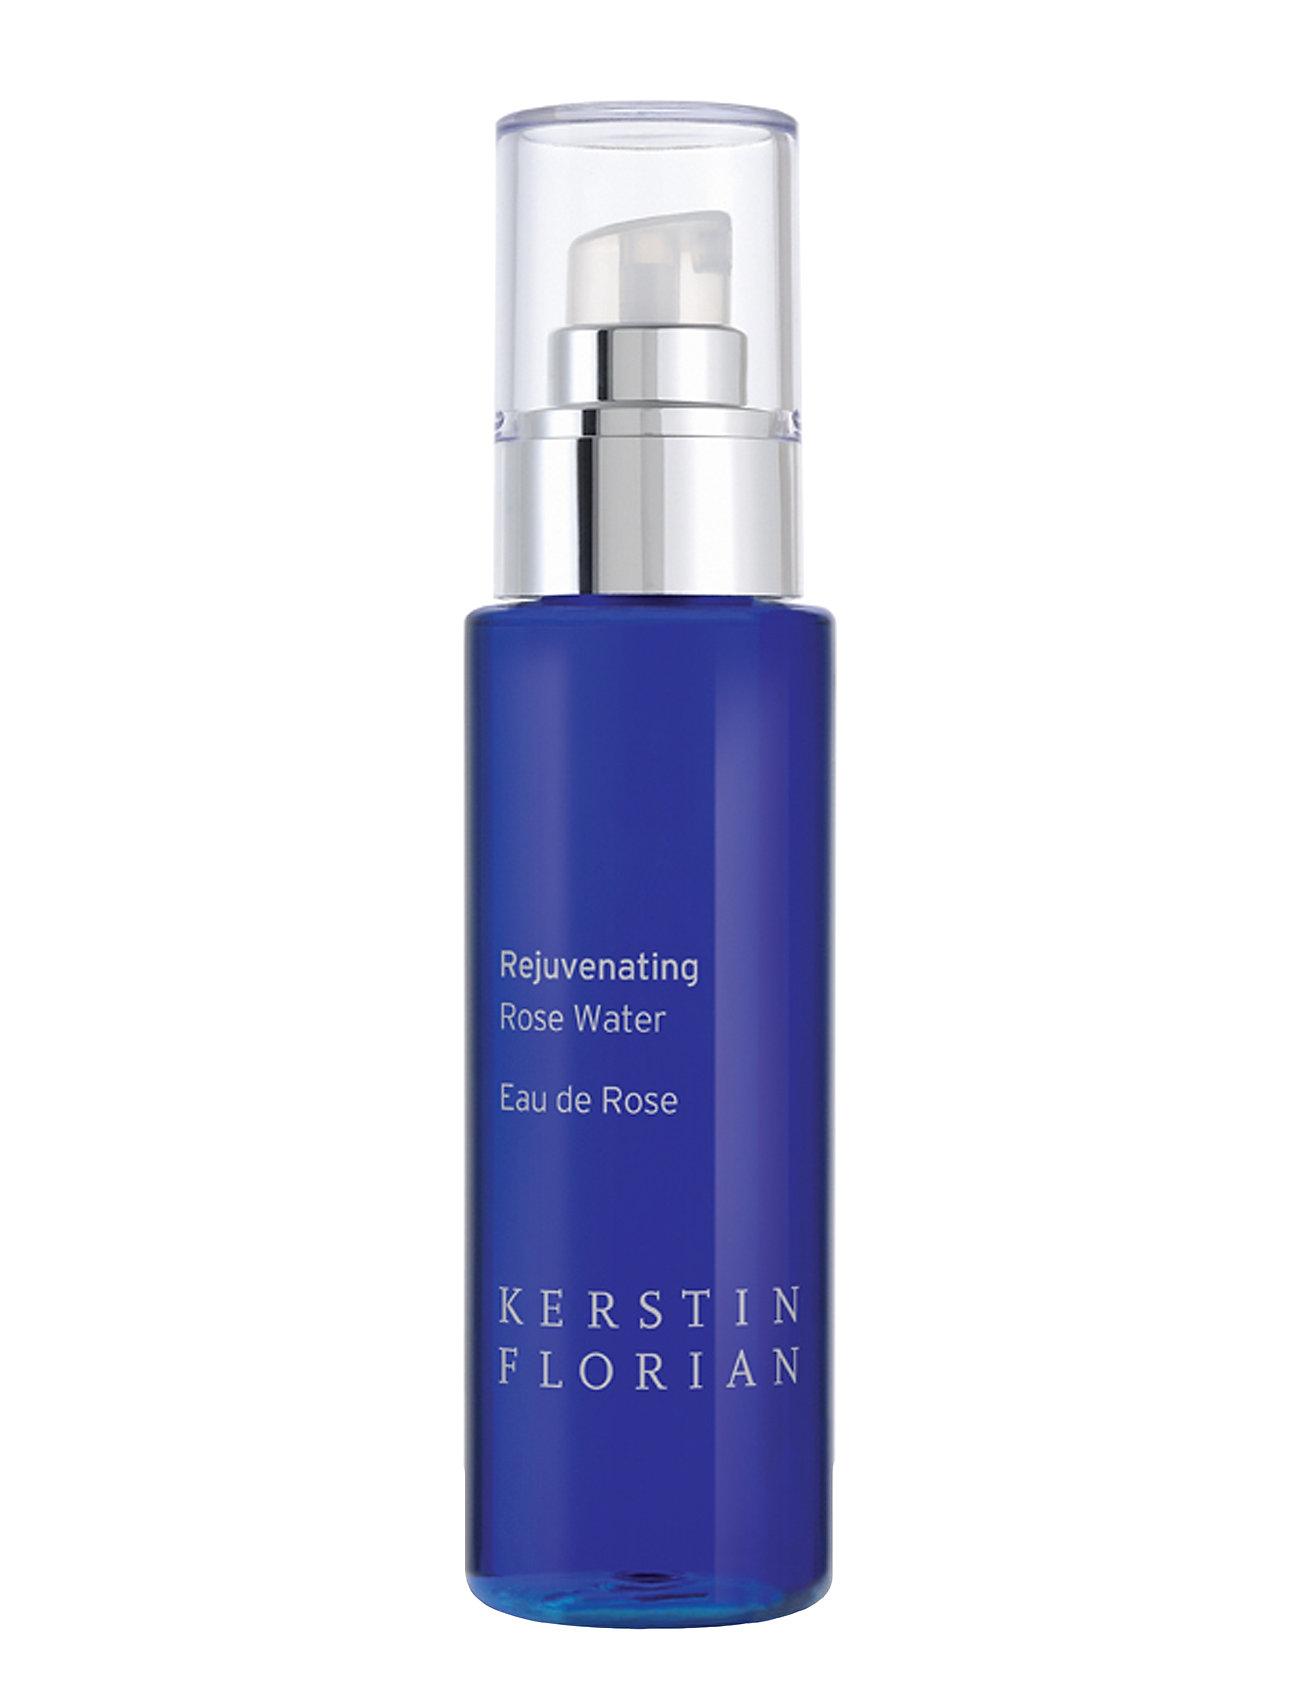 Image of Rejuvenating Rose Water Beauty WOMEN Skin Care Face Face Mist Nude Kerstin Florian (3077236733)